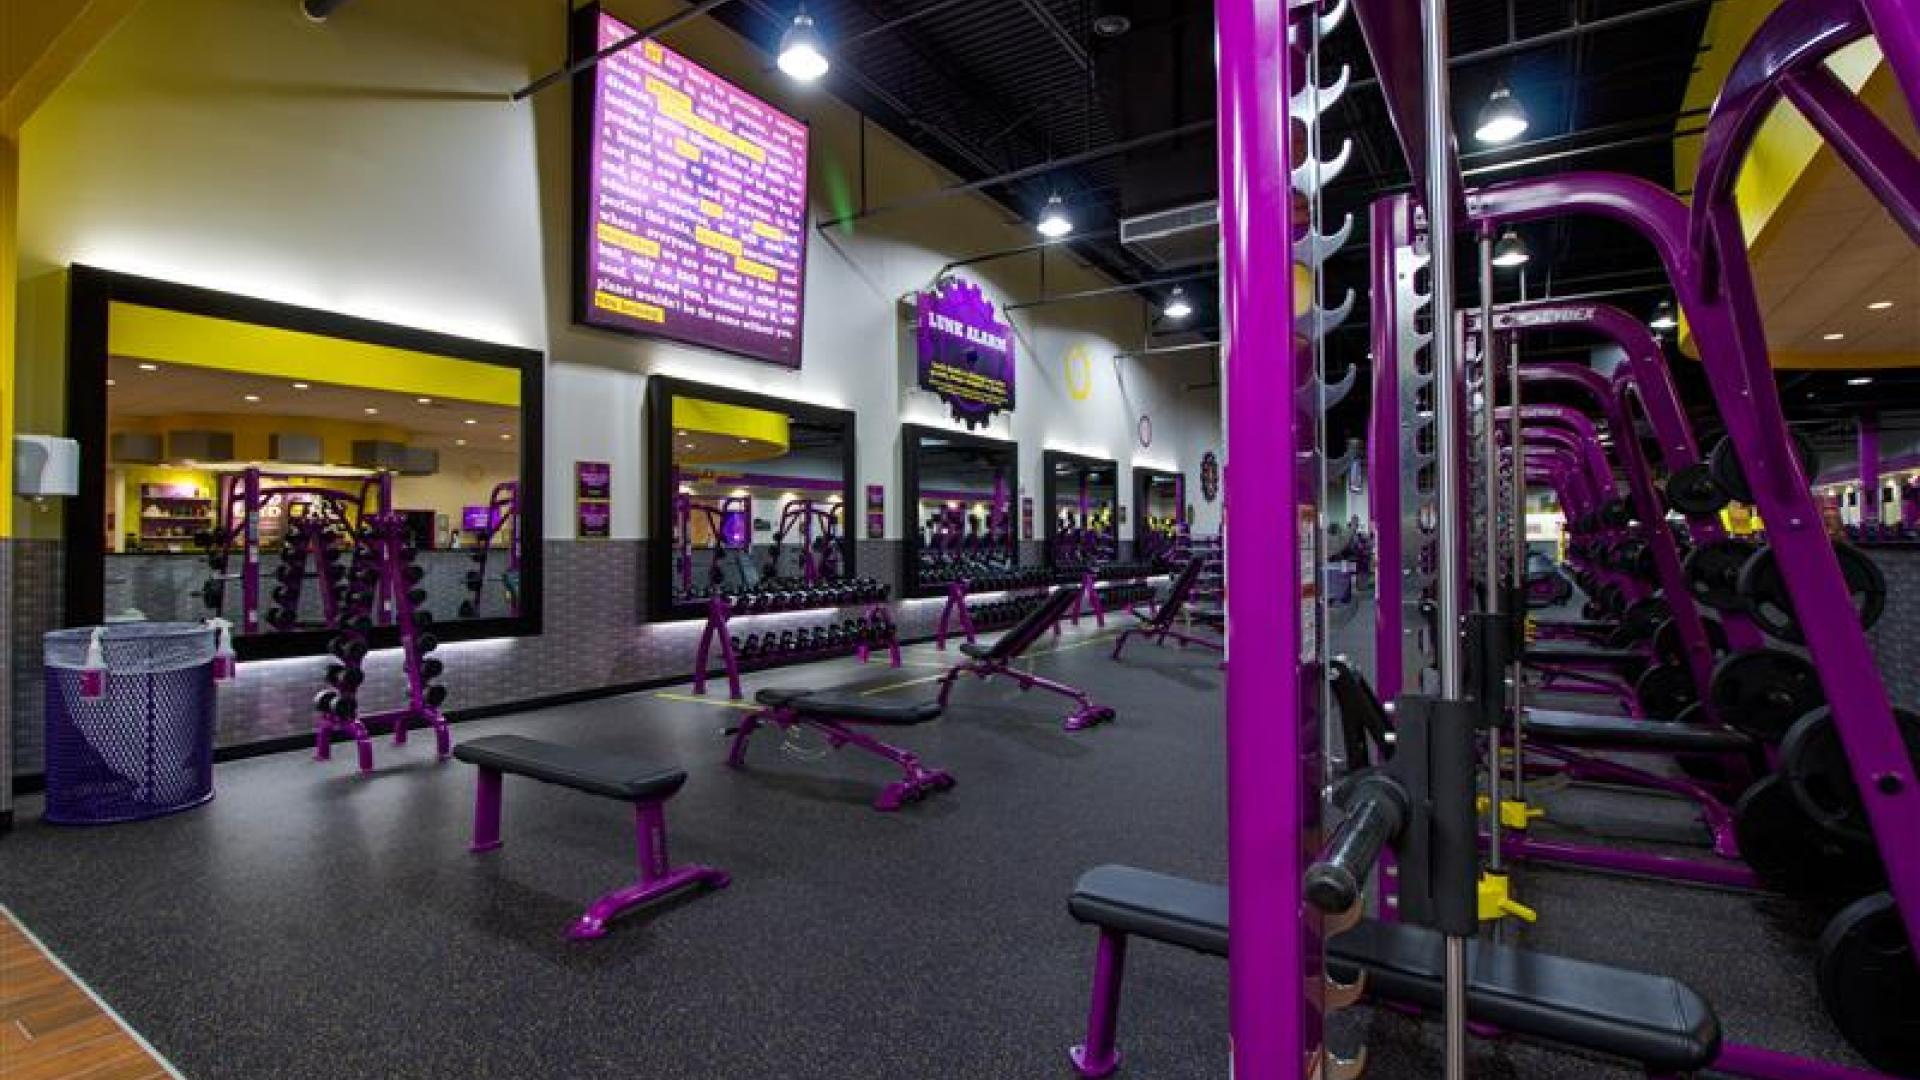 Gym in Augusta GA  2115 Windsor Spring Rd  Planet Fitness